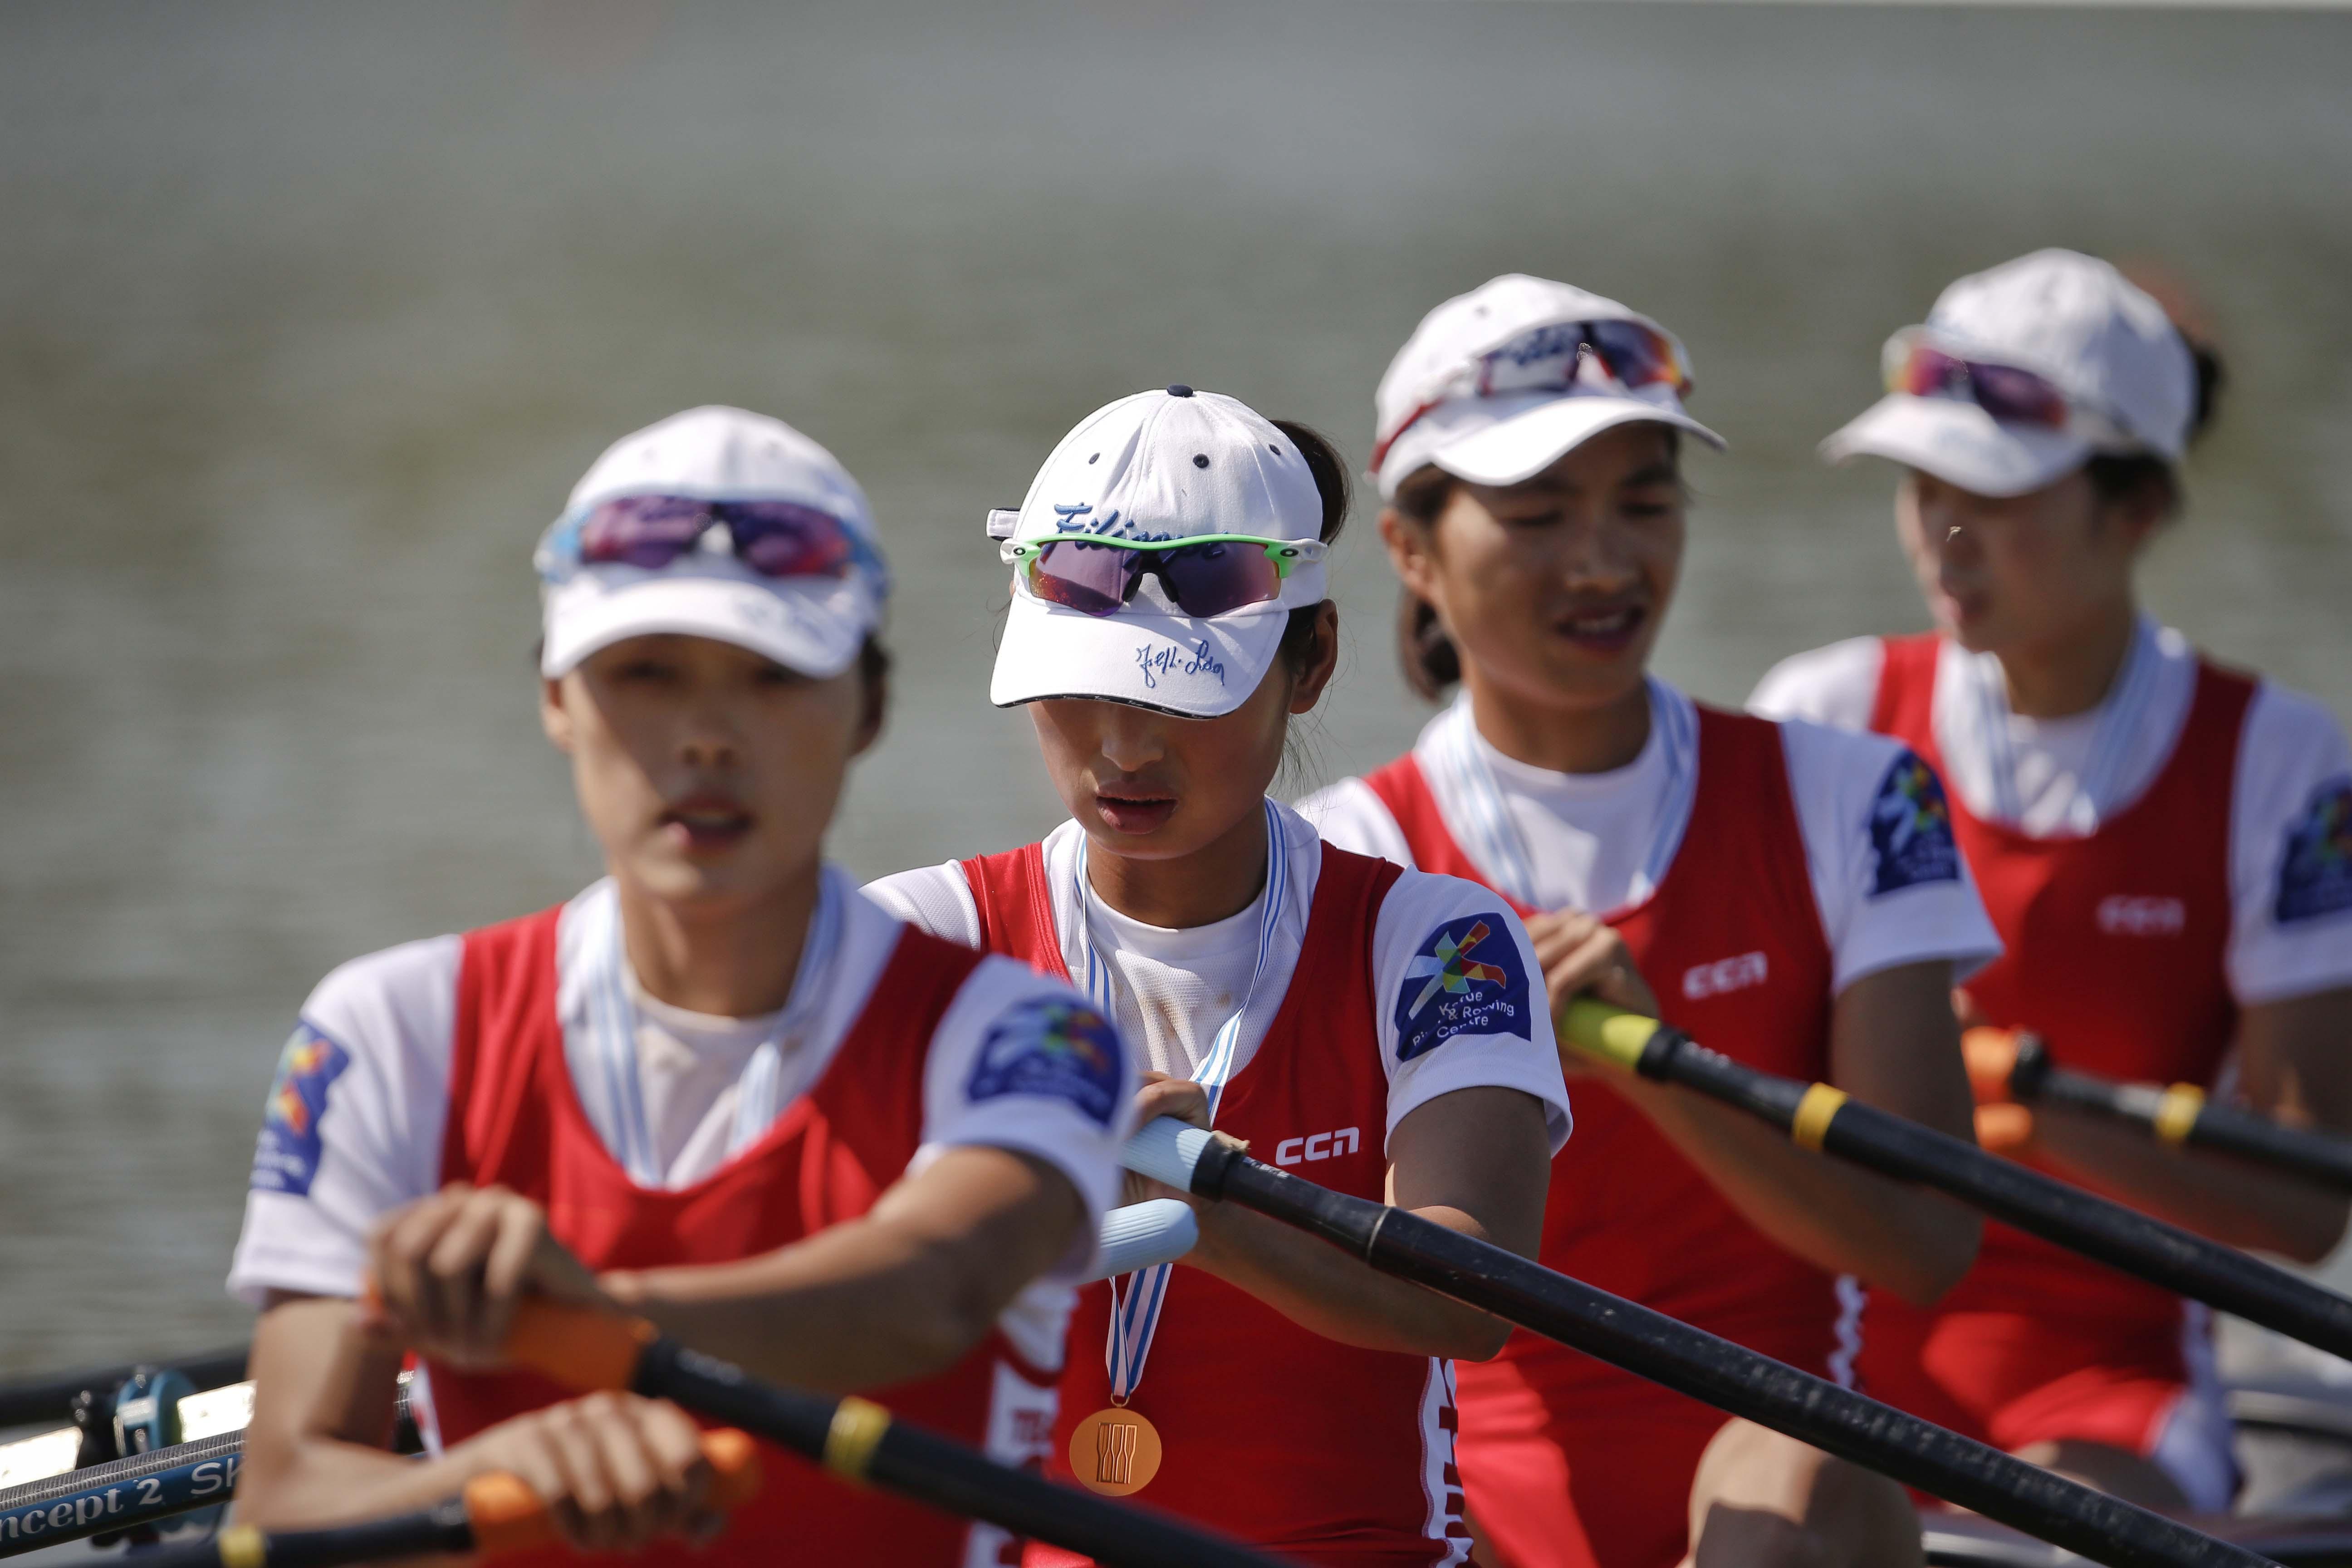 China won the gold medal at the World Rowing Championships